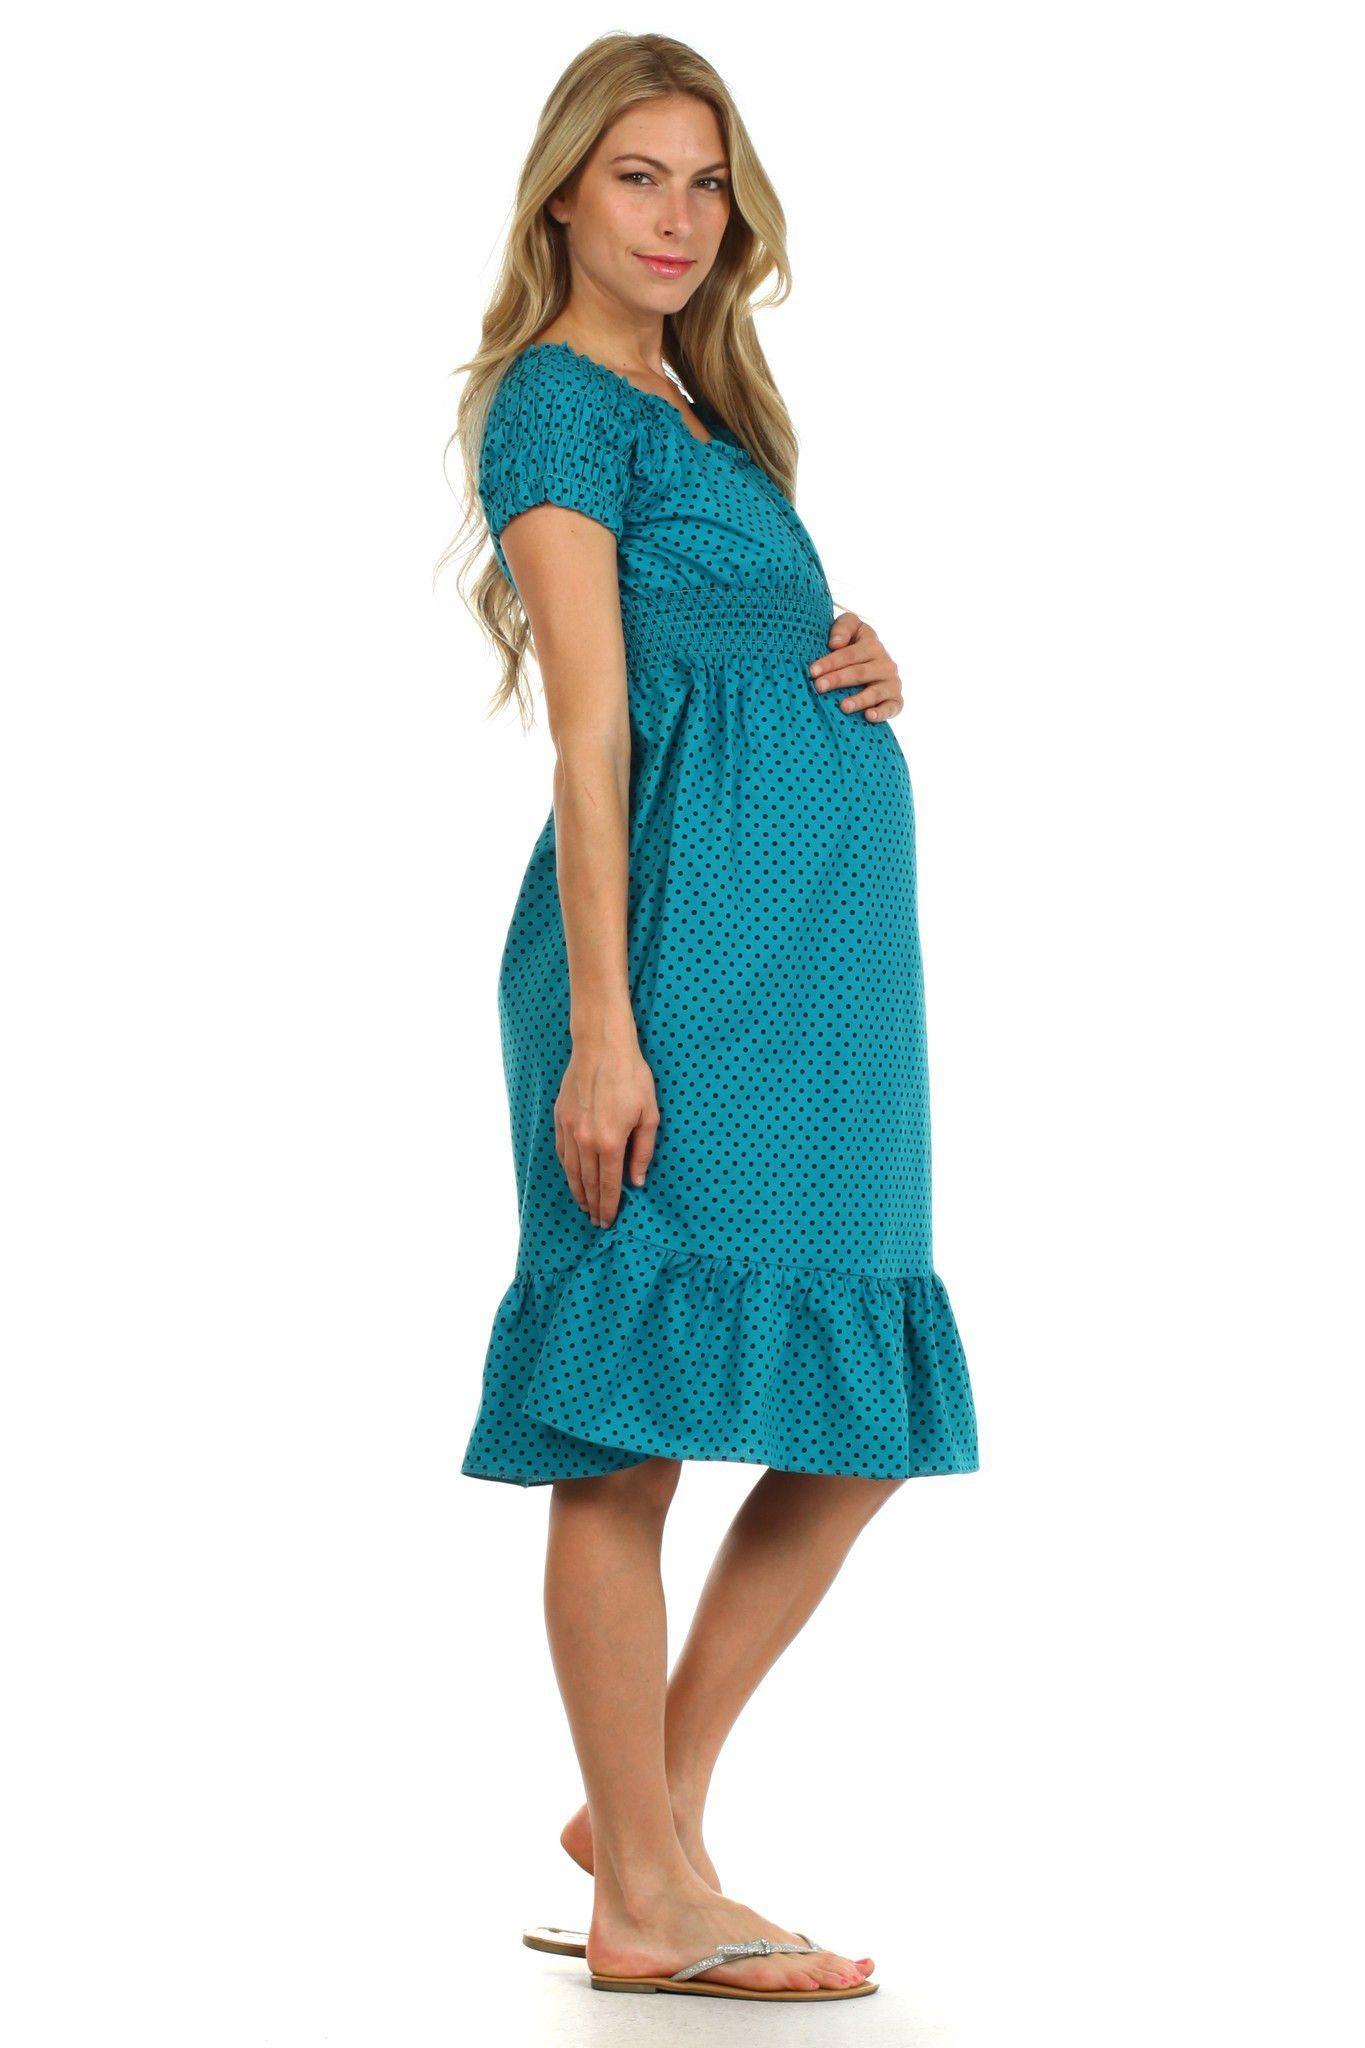 Breastfeeding dresses for weddings  Kate Ruffled Peasant Nursing Dress  Nursing dress Maternity and